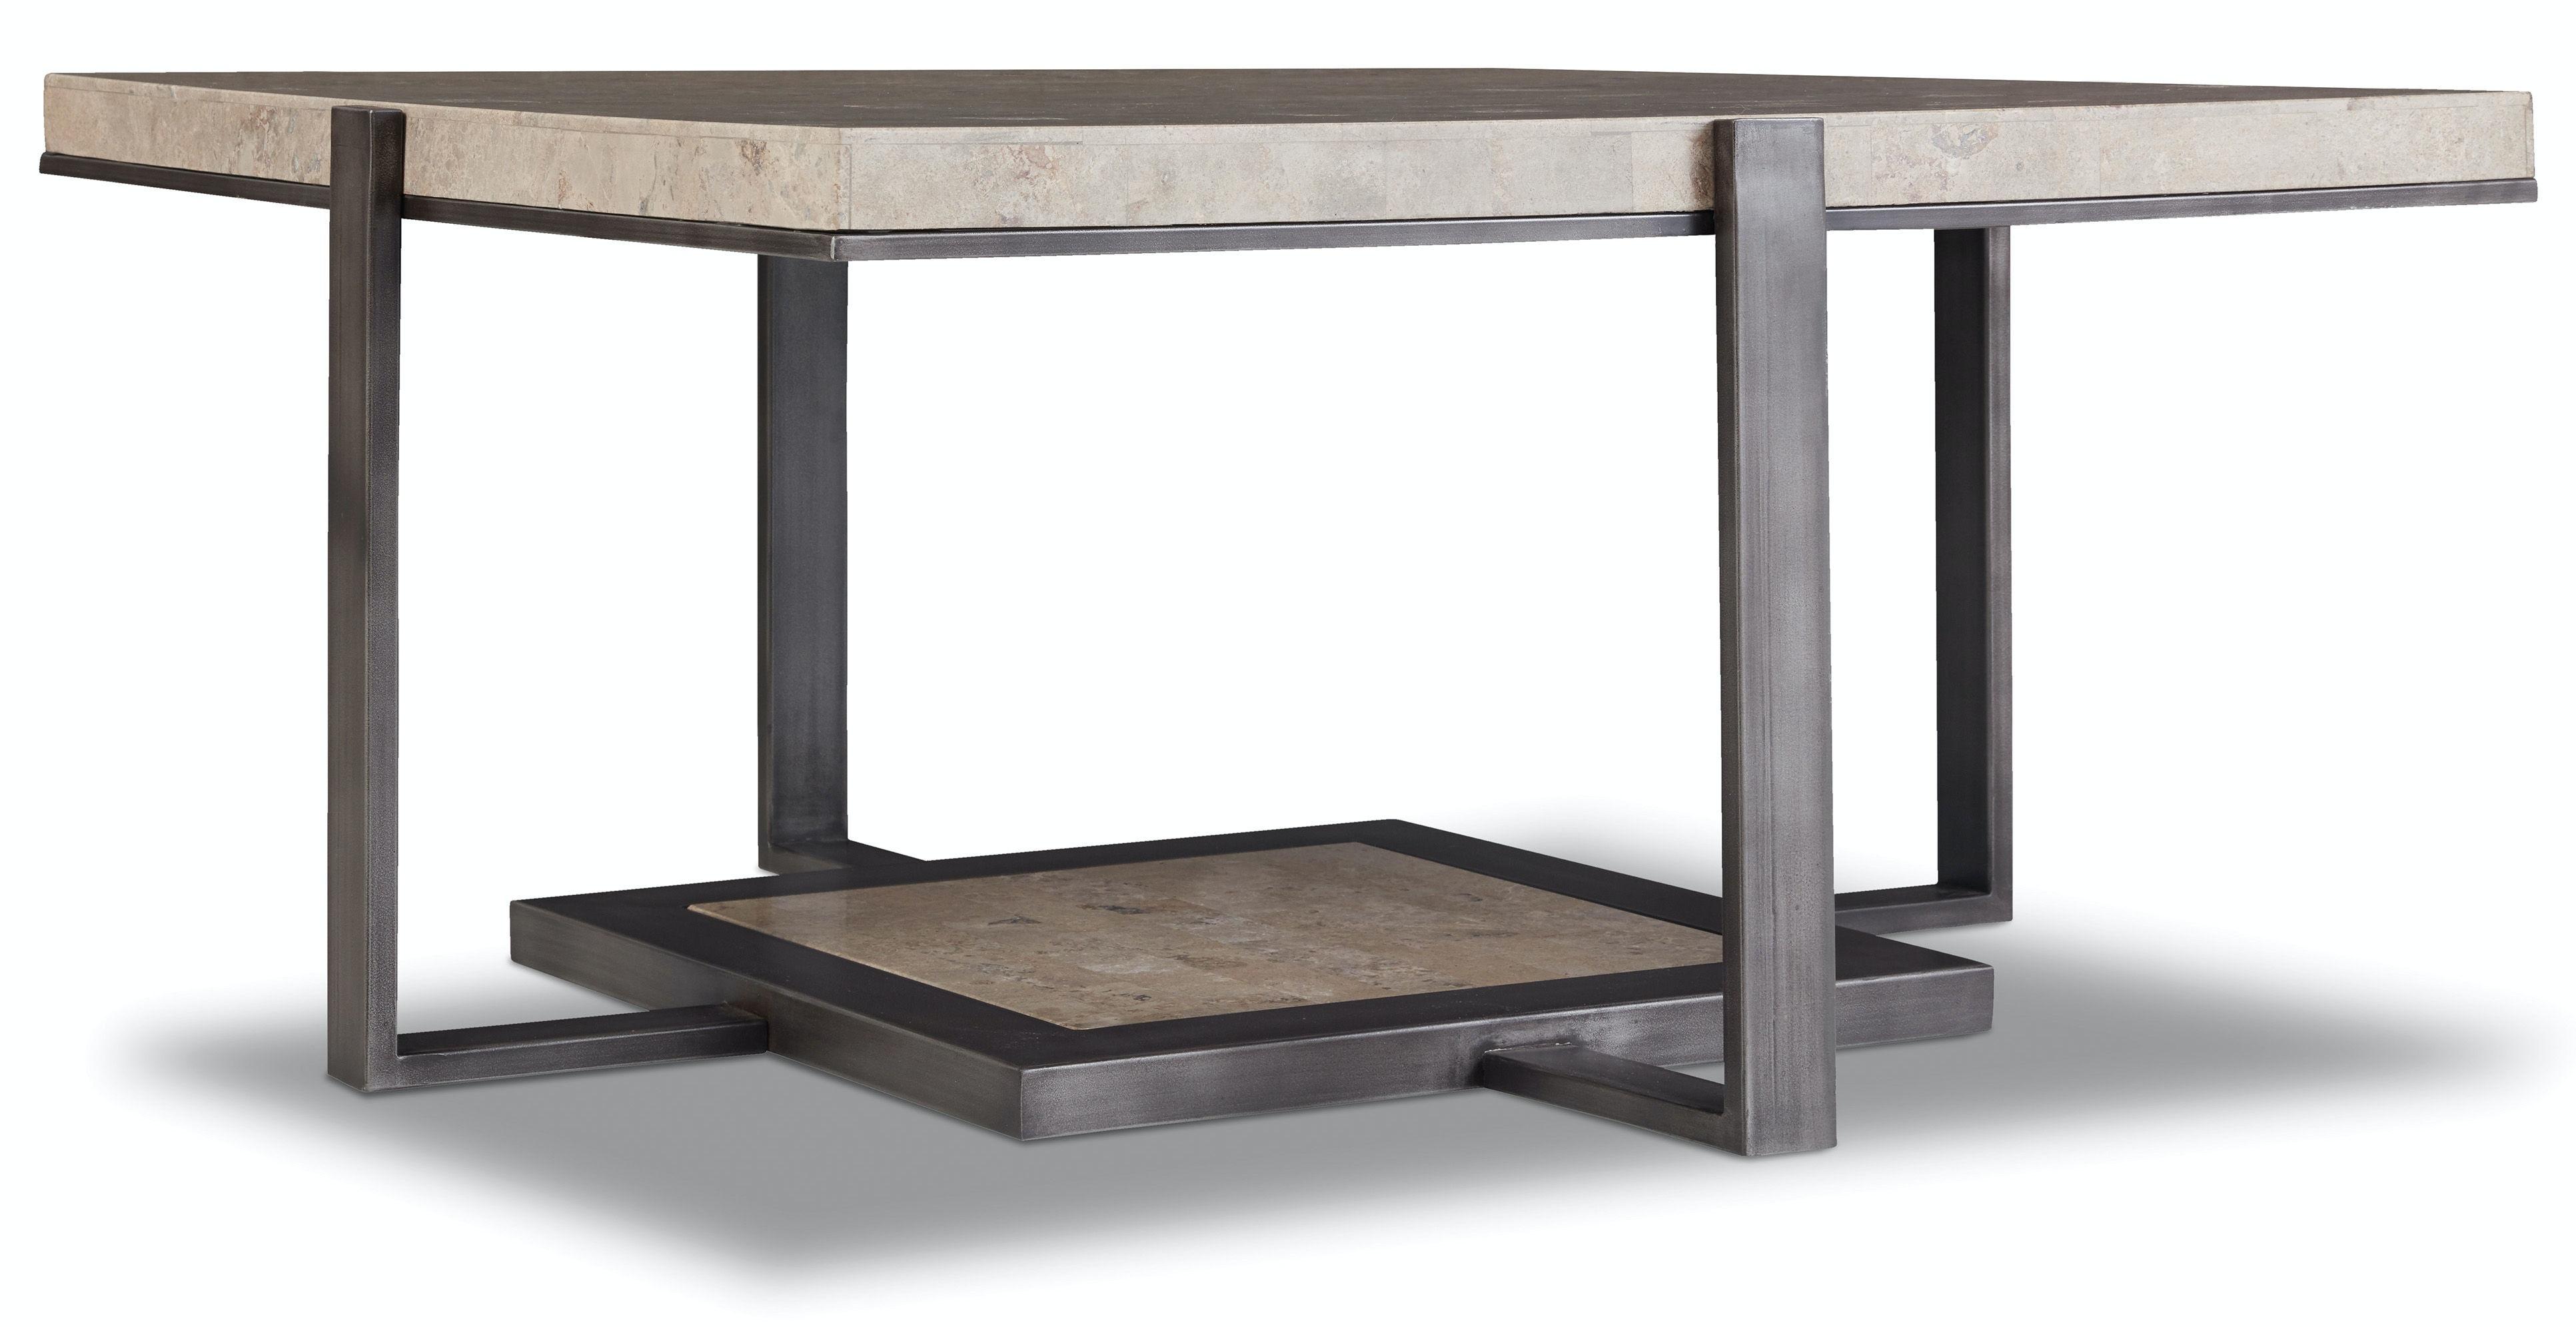 Hooker Furniture Square Cocktail Table 5533 80112 LTBR